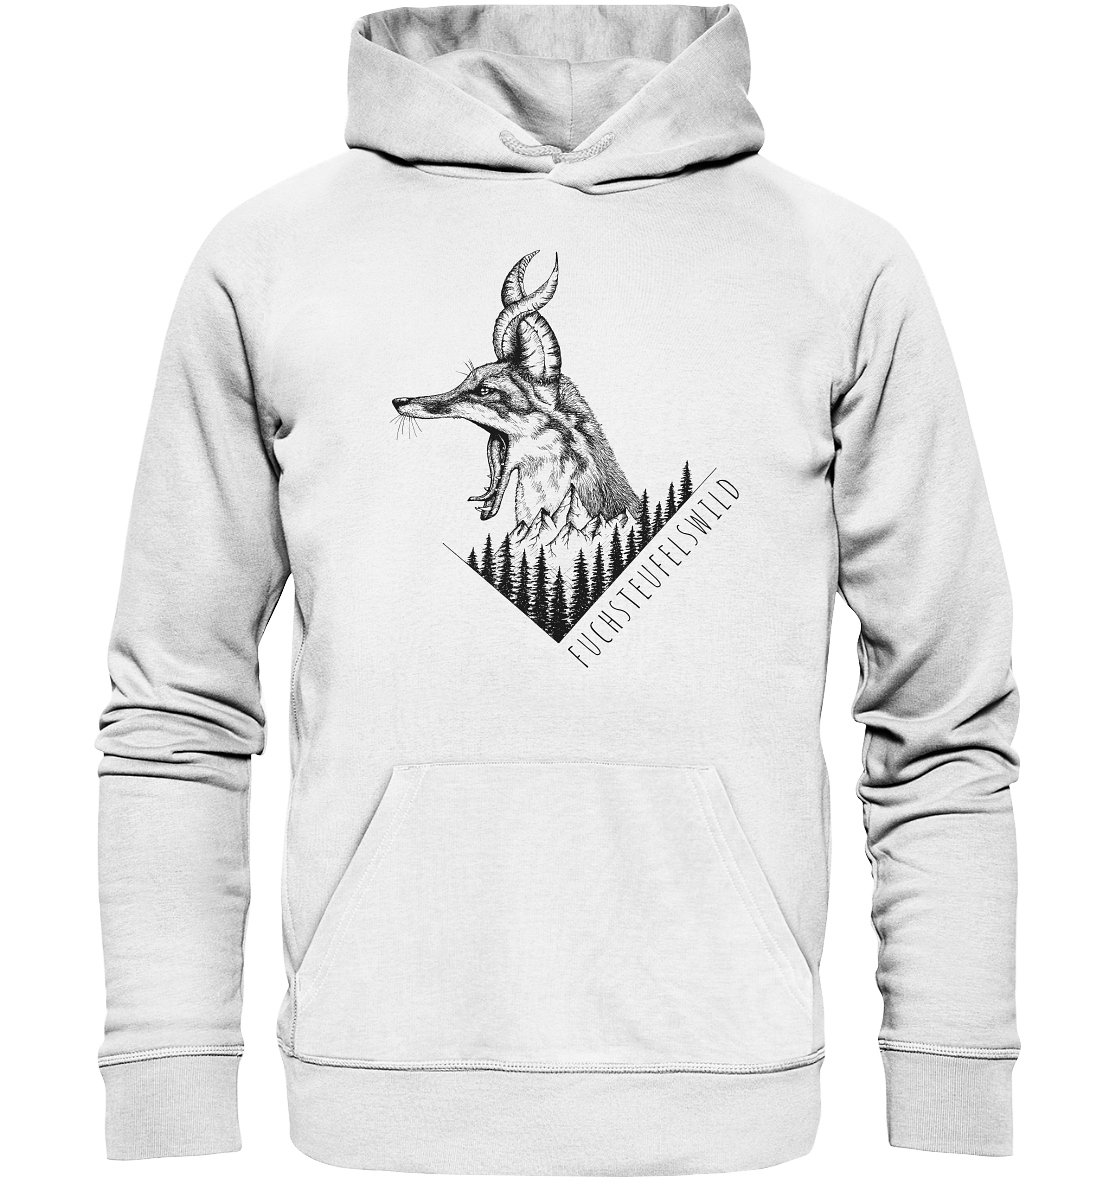 front-organic-hoodie-f8f8f8-1116x-4.png